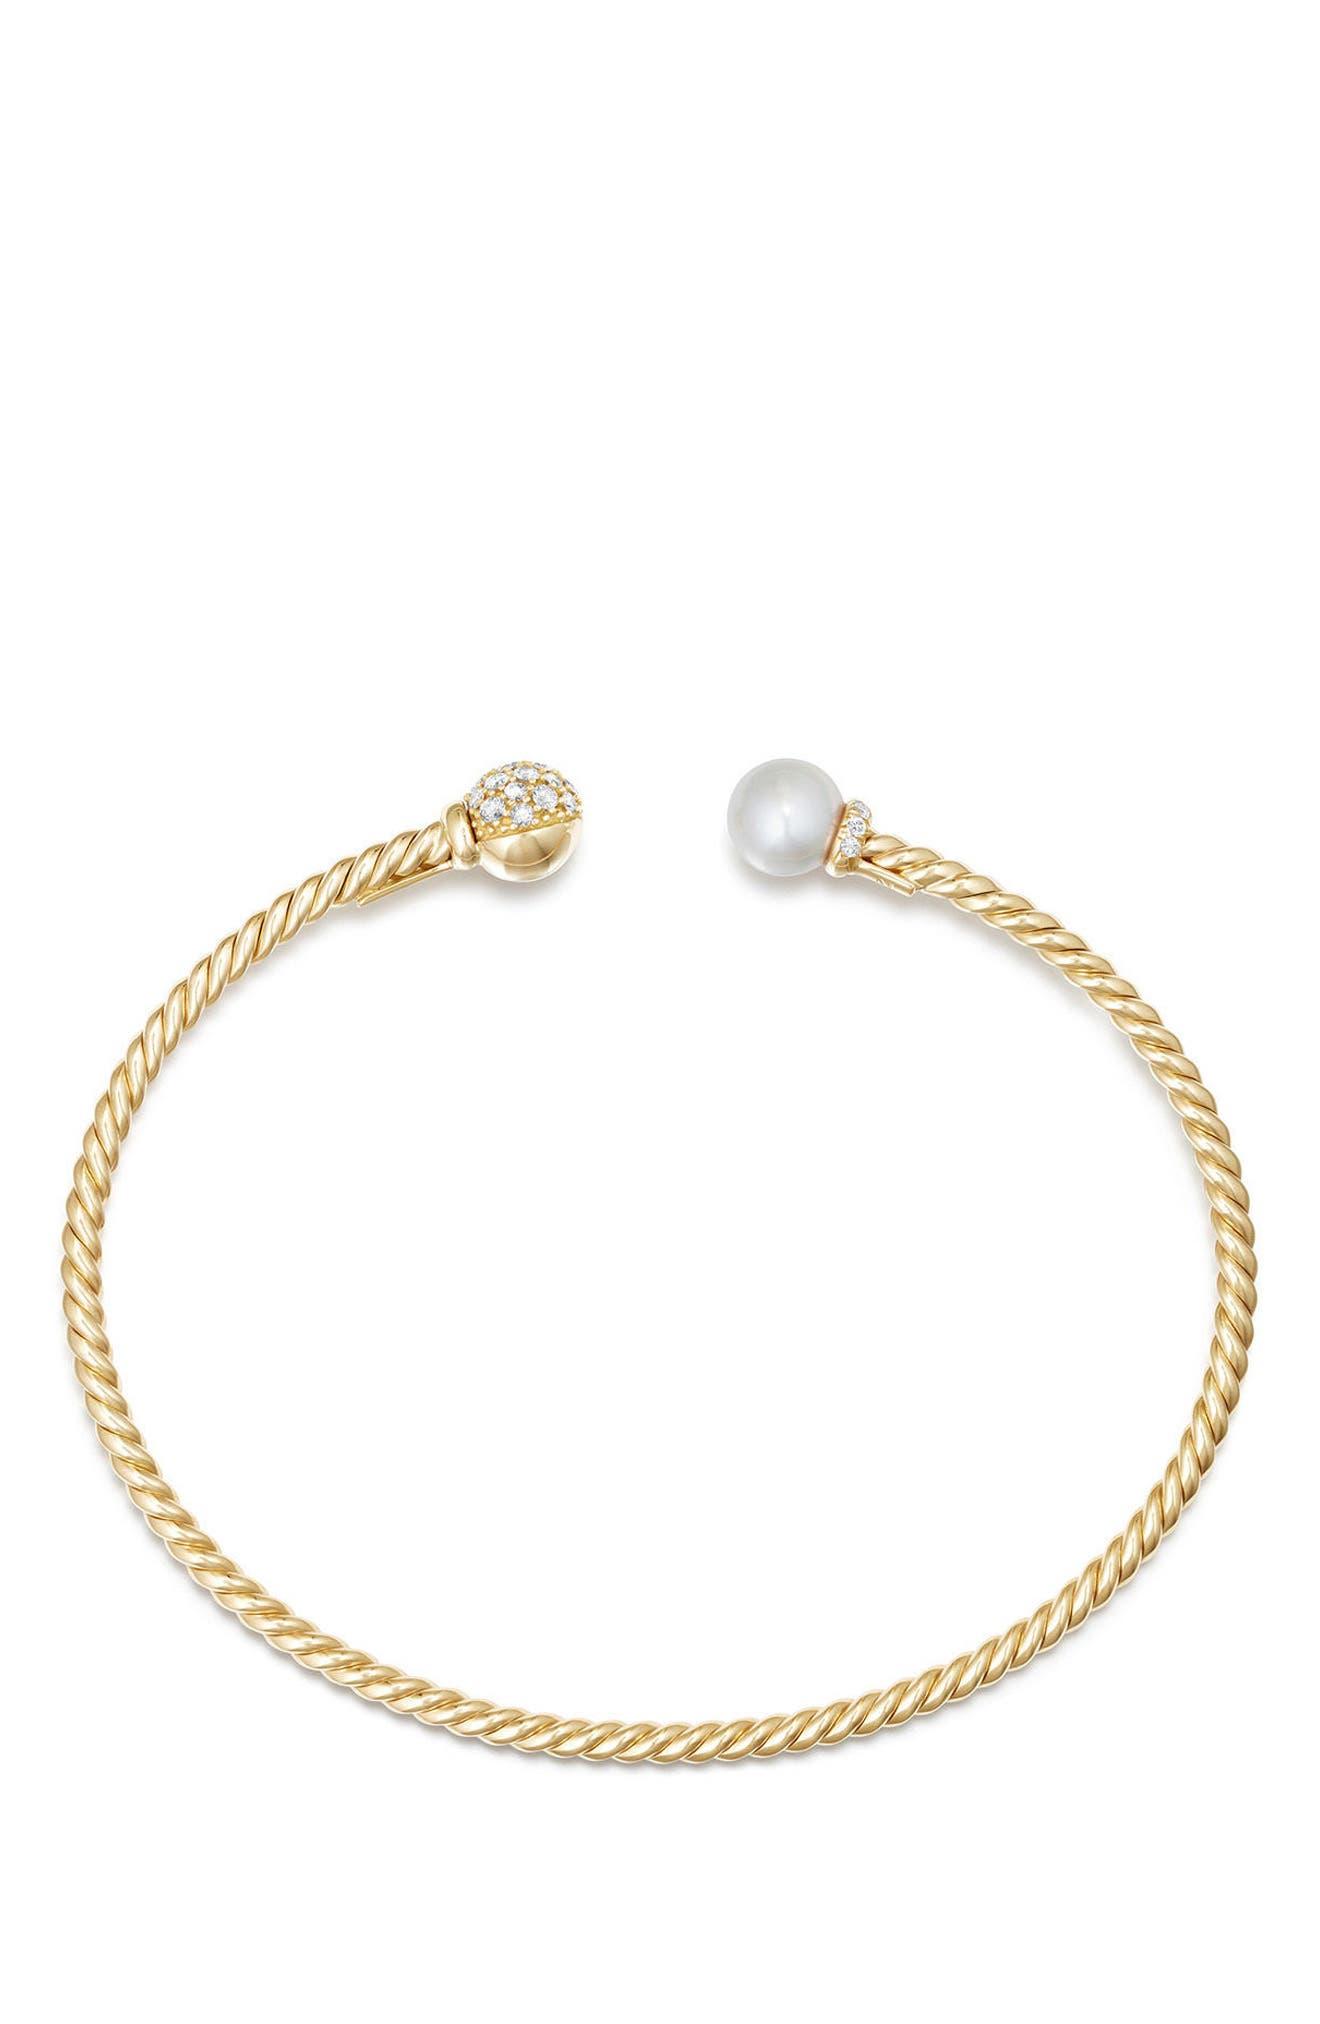 Solari Bead & Pearl Bracelet with Diamonds in 18K Gold,                             Alternate thumbnail 2, color,                             Yellow Gold/ Diamond/ Pearl